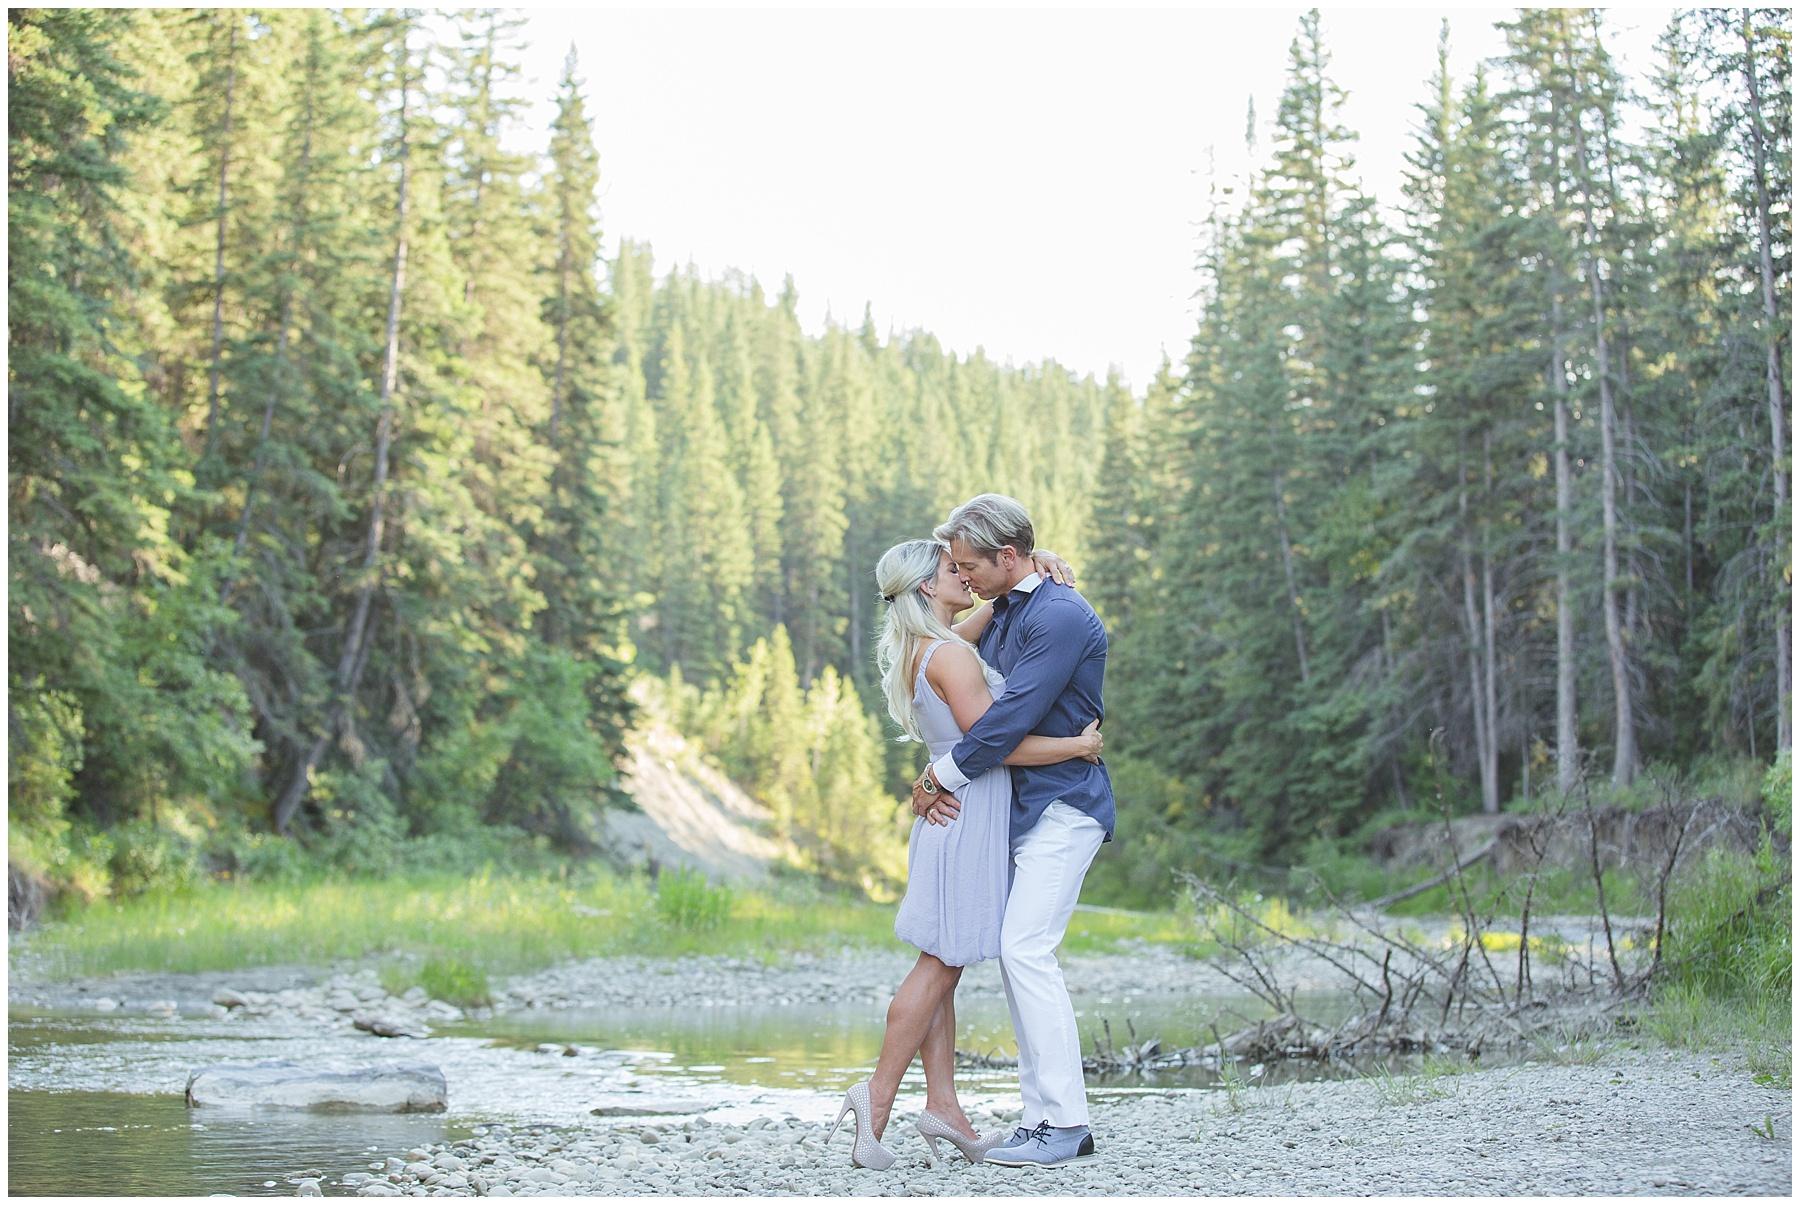 Fish Creek Park Engagement Photography